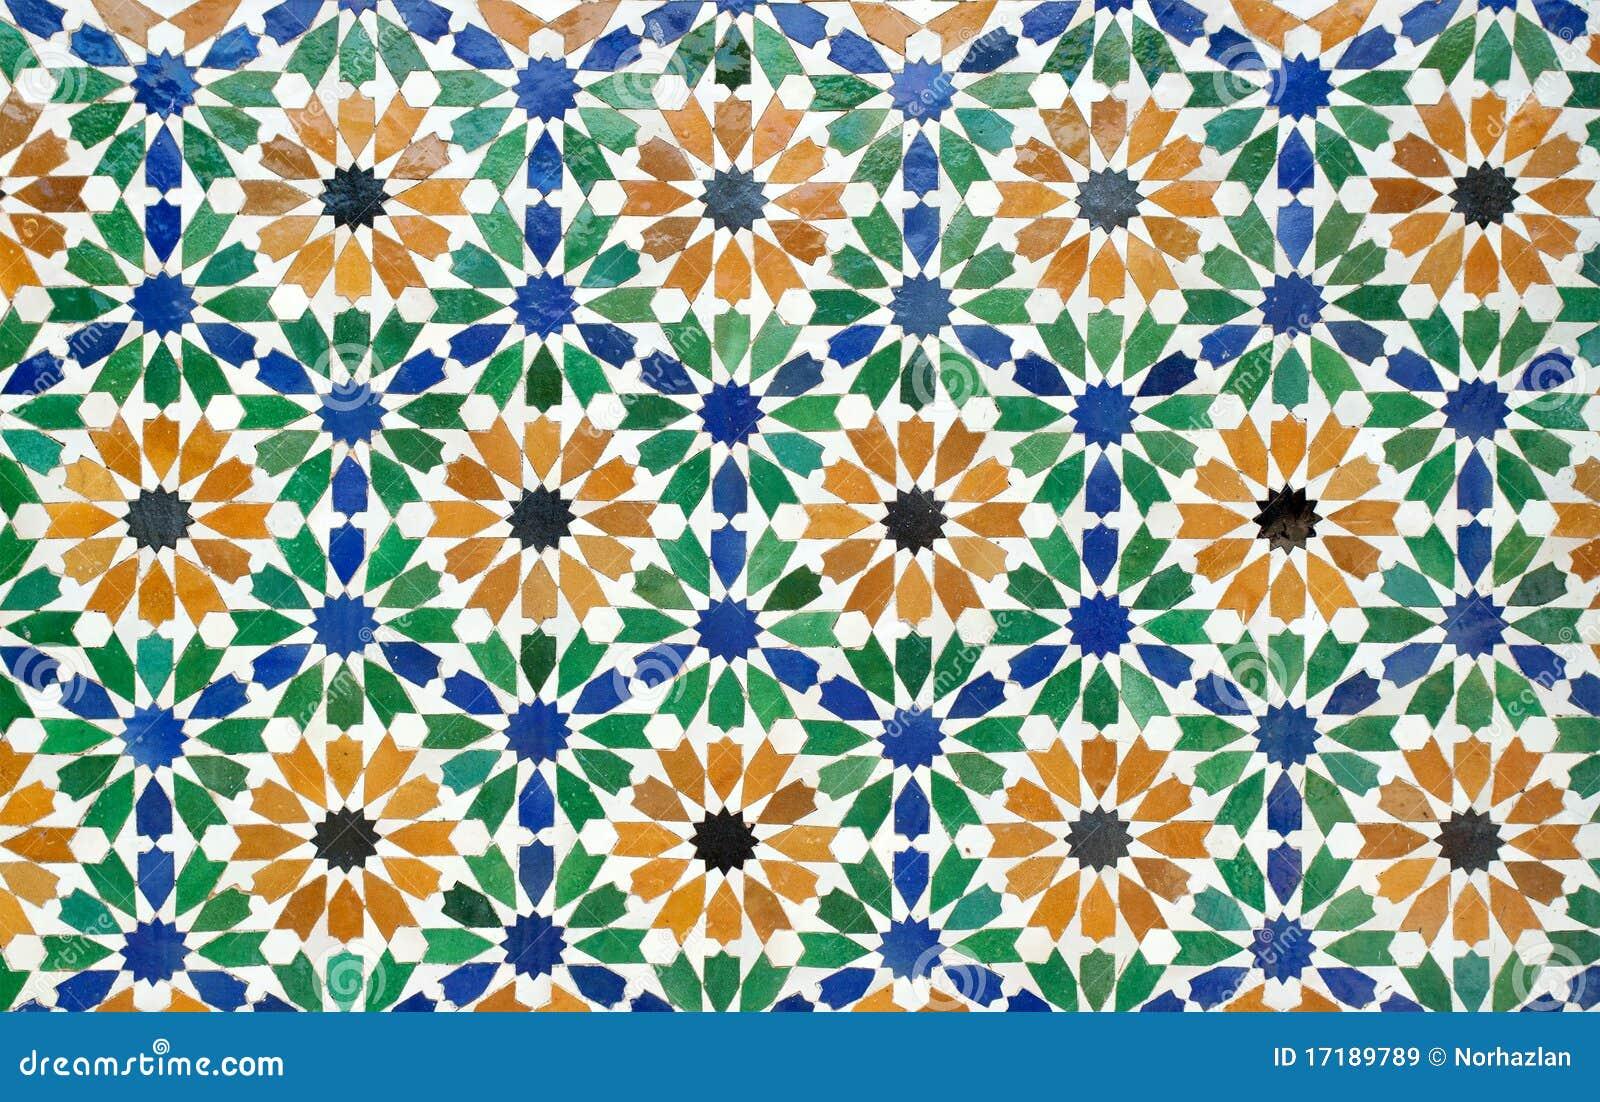 marokko fliesen lizenzfreie stockbilder bild 17189789. Black Bedroom Furniture Sets. Home Design Ideas